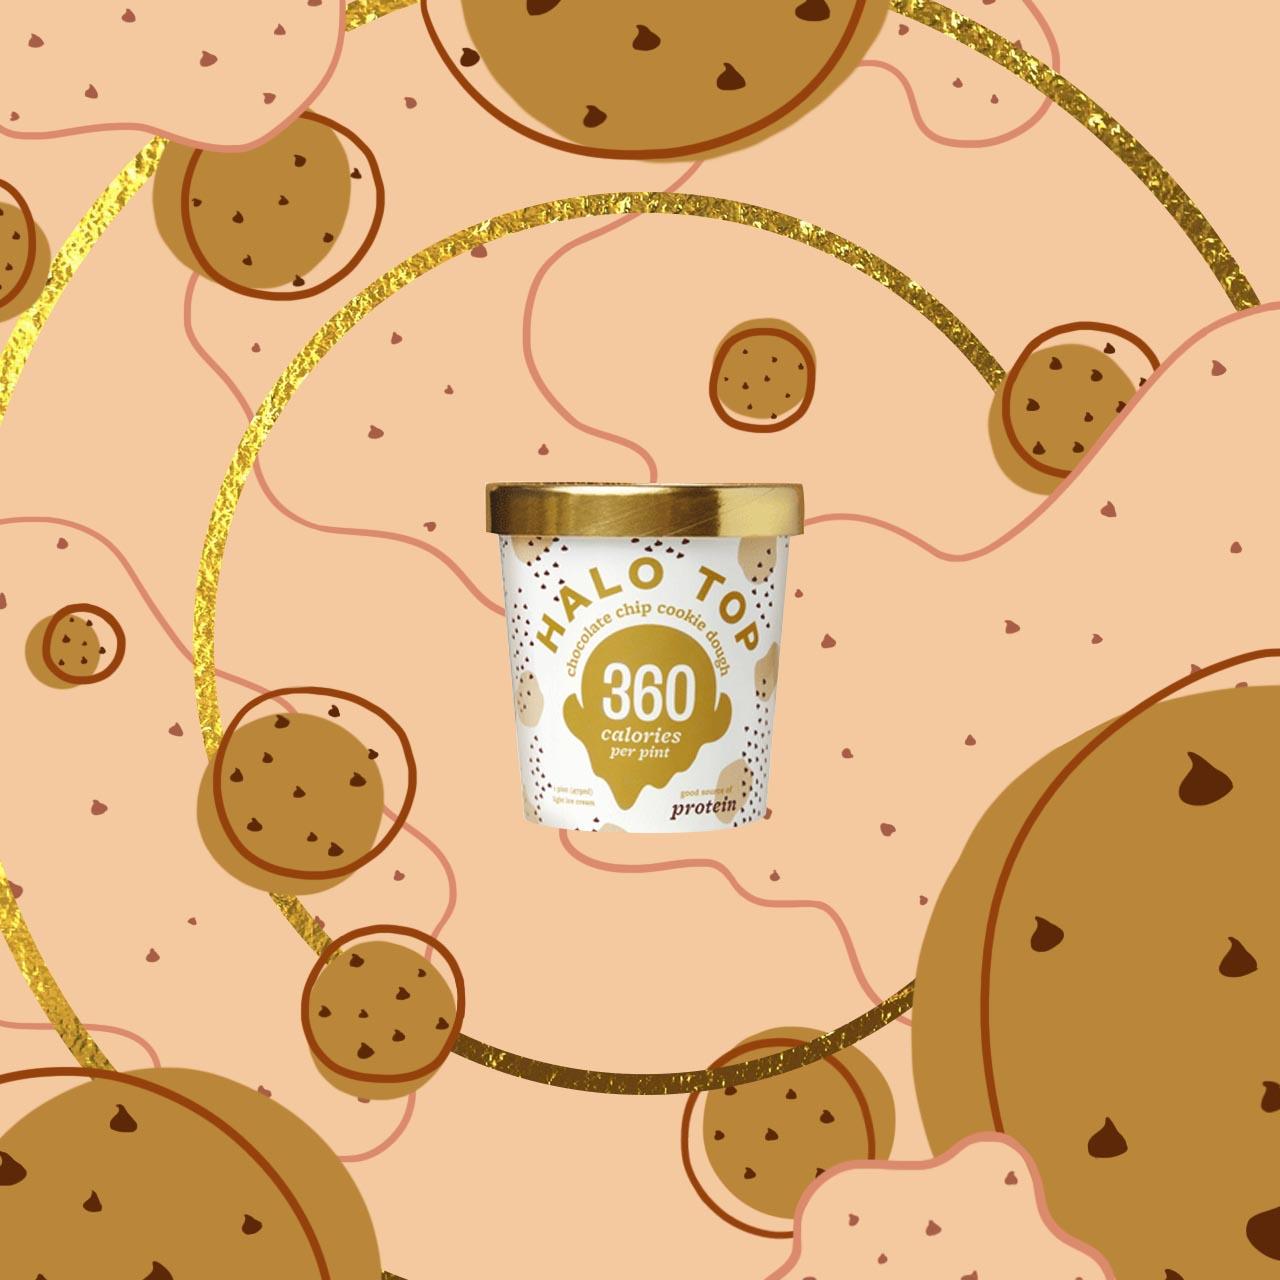 2_cookiedough_v001.jpg